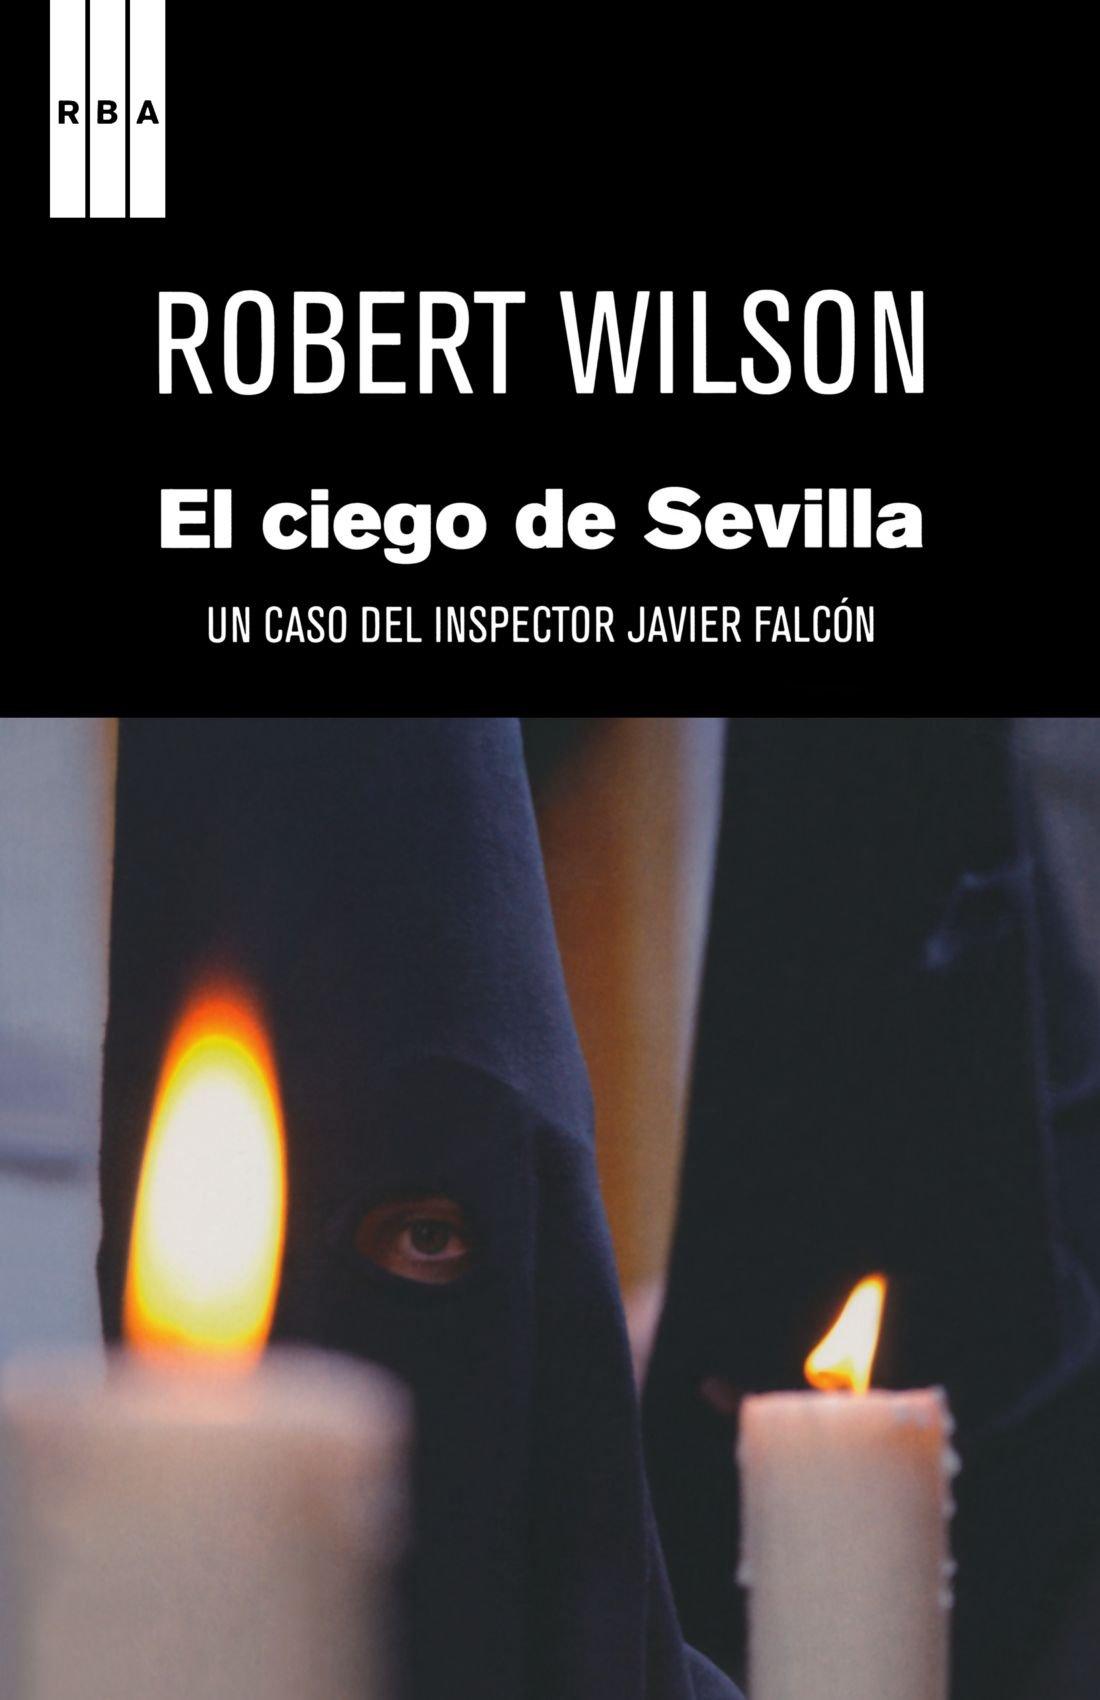 El ciego de sevilla (NOVELA POLICÍACA): Amazon.es: ROBERT WILSON , ESTHER ROIG GIMENEZ: Libros